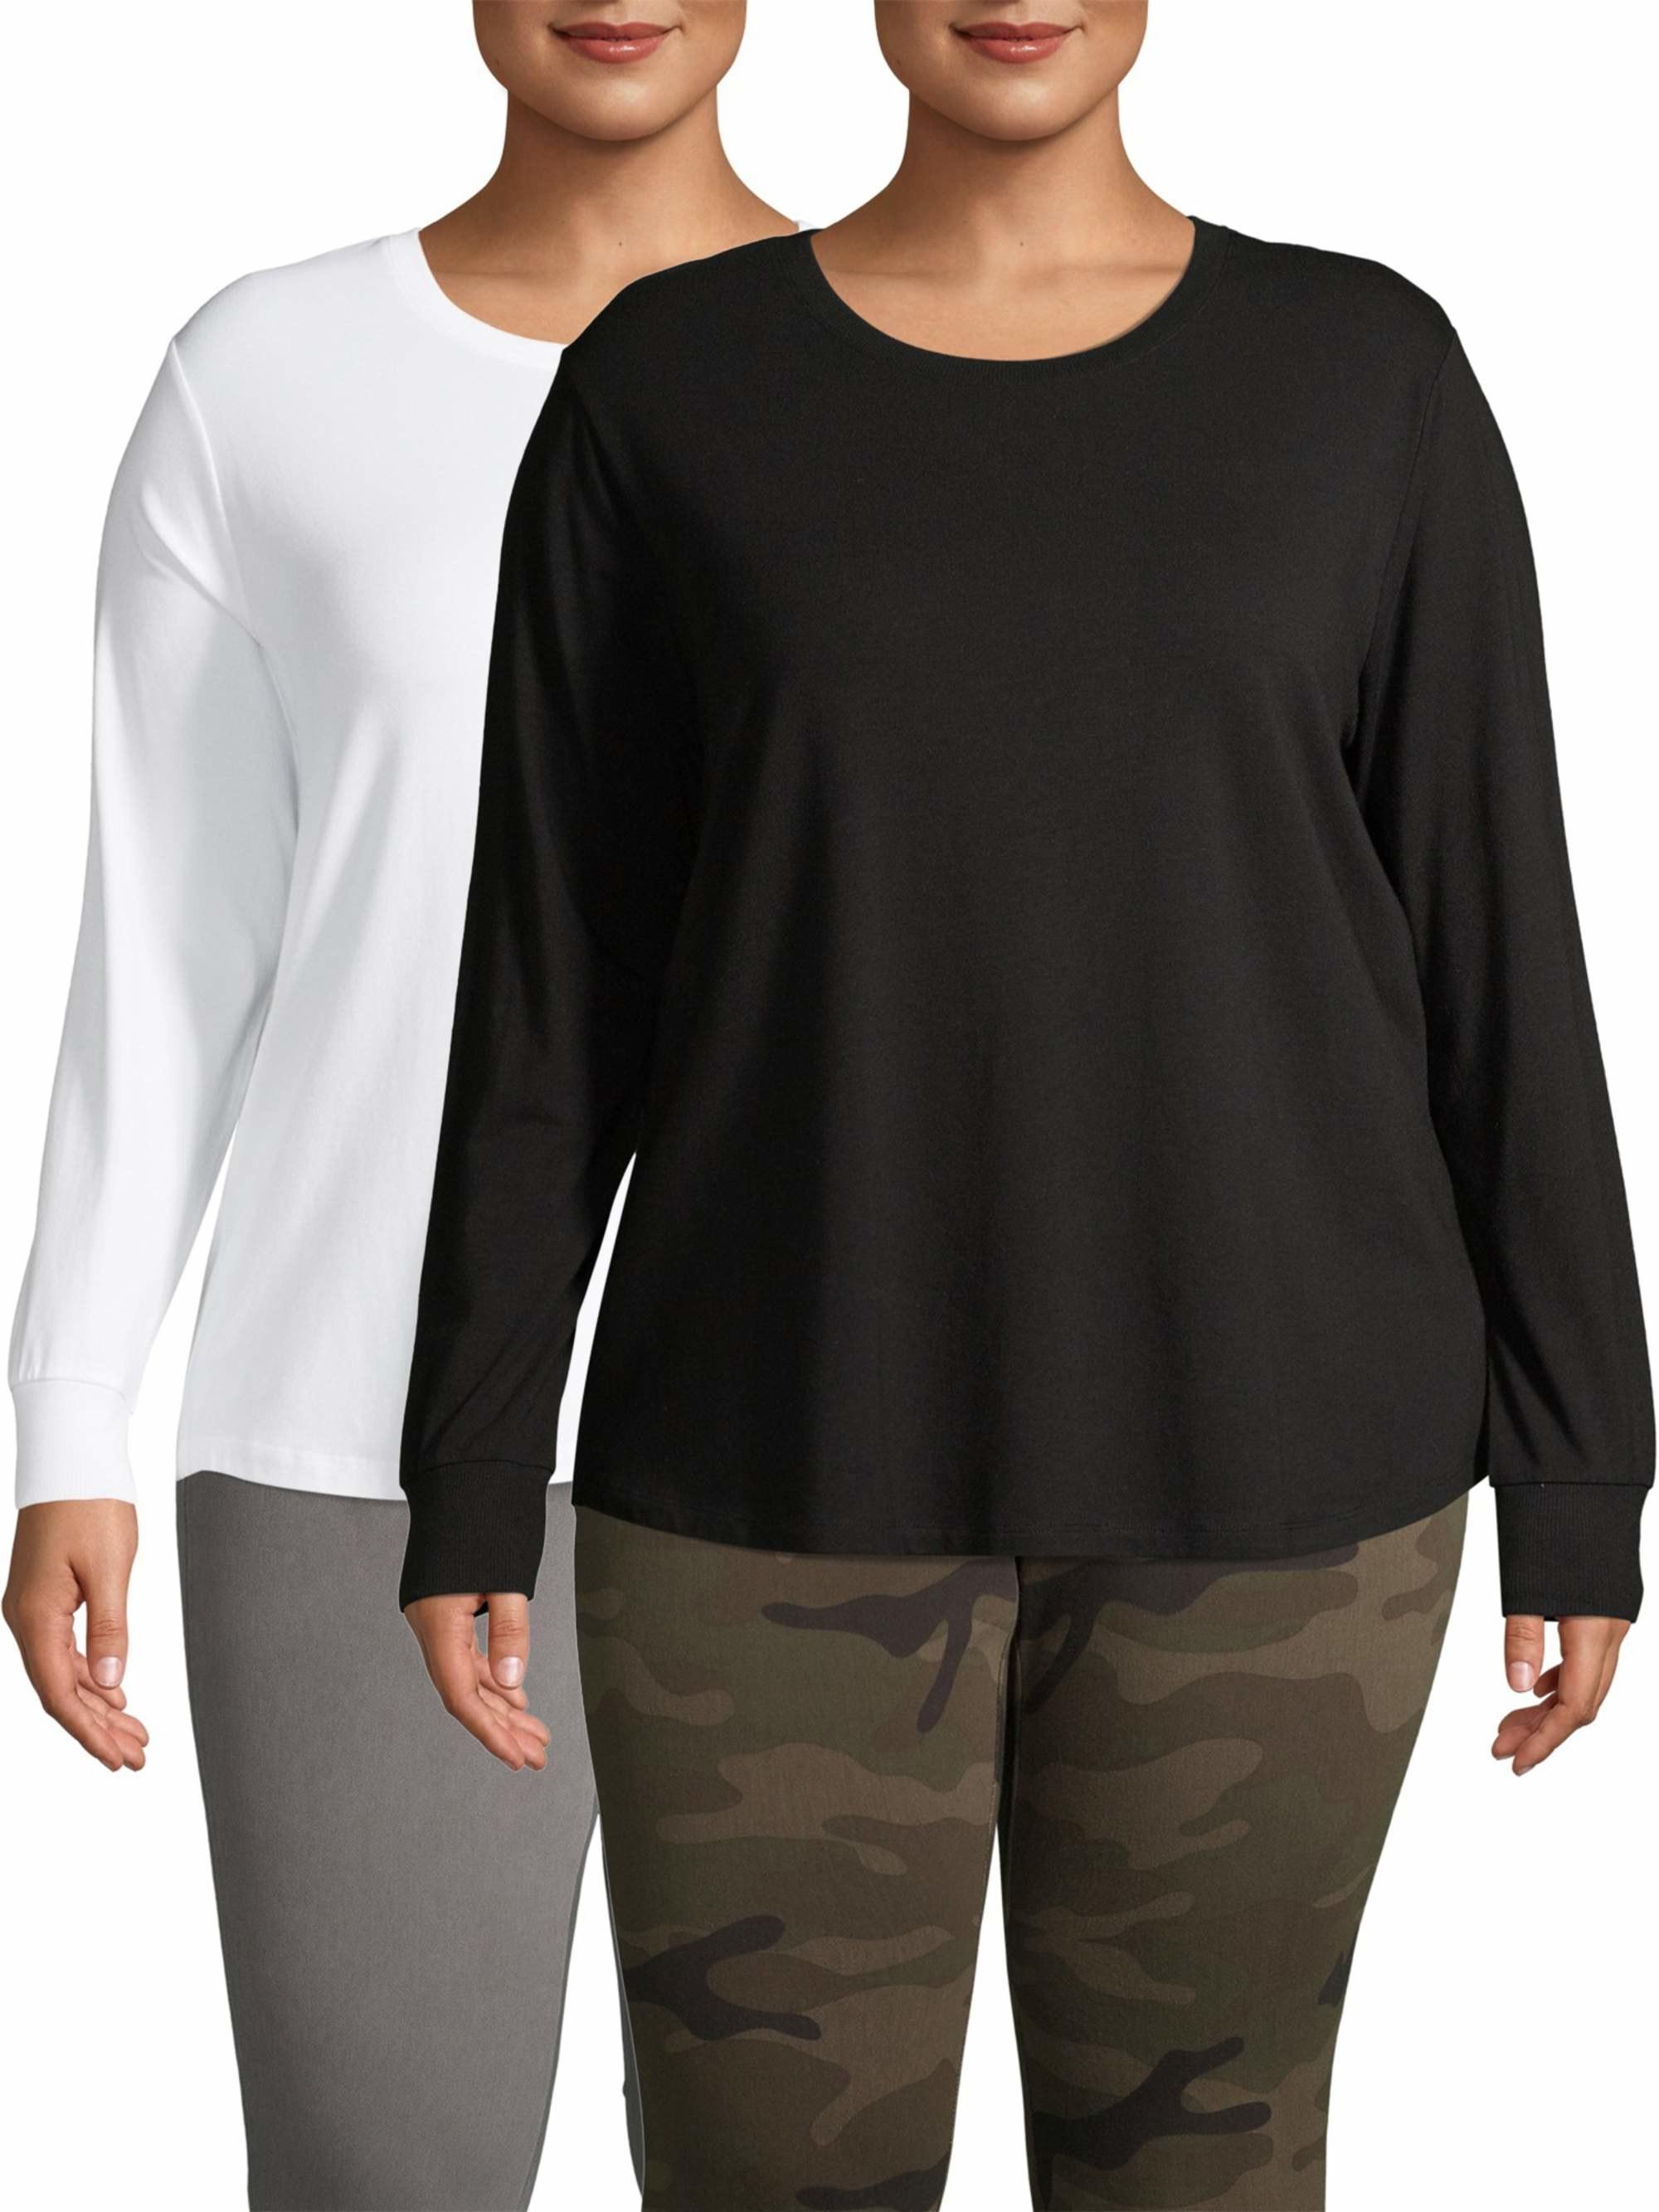 A black and a white longs-sleeve shirt